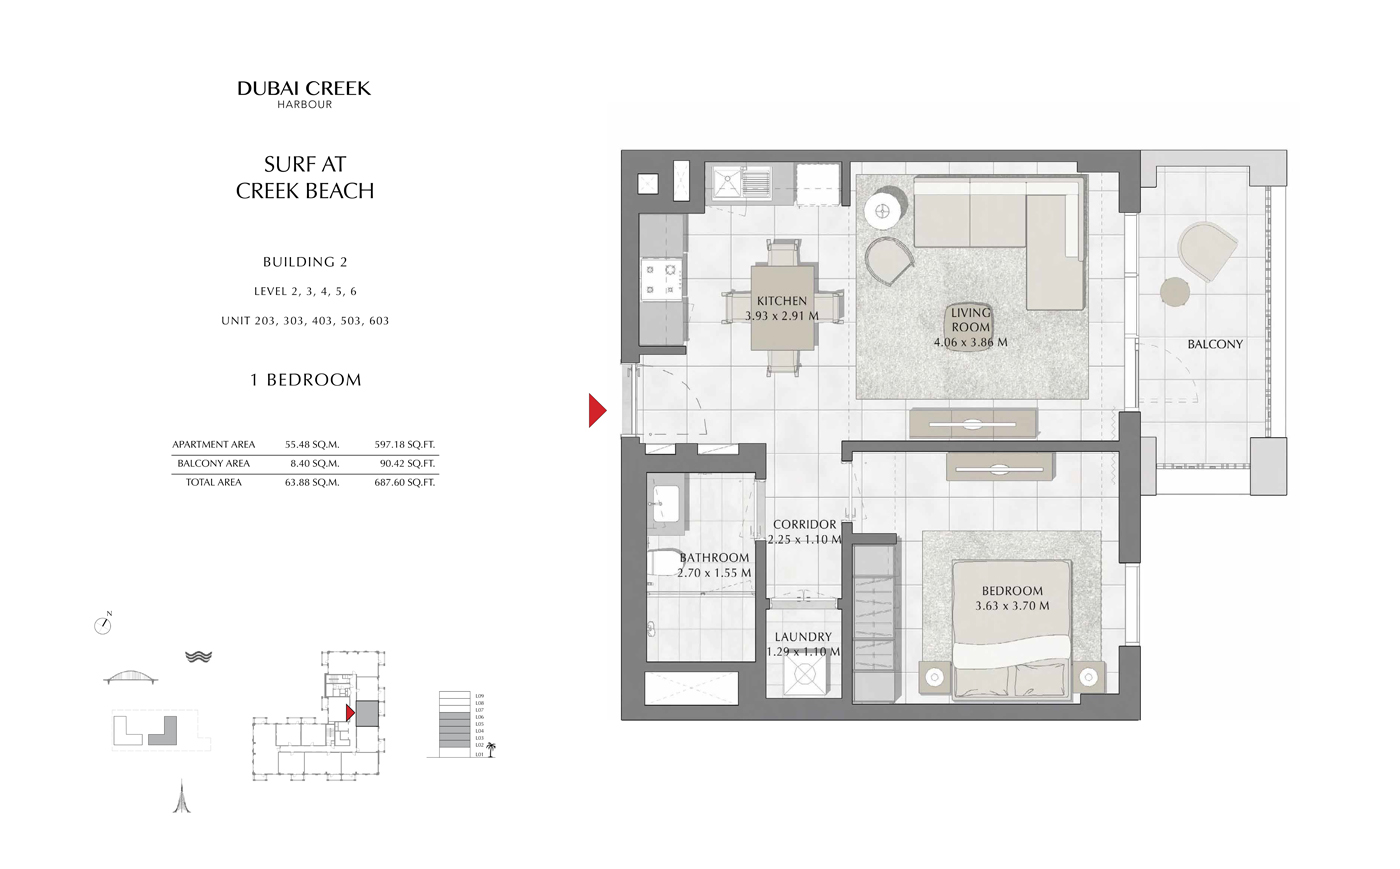 Building 2, 1 Bedroom Level 2, 3, 4, 5, 6, Size 687 Sq Ft